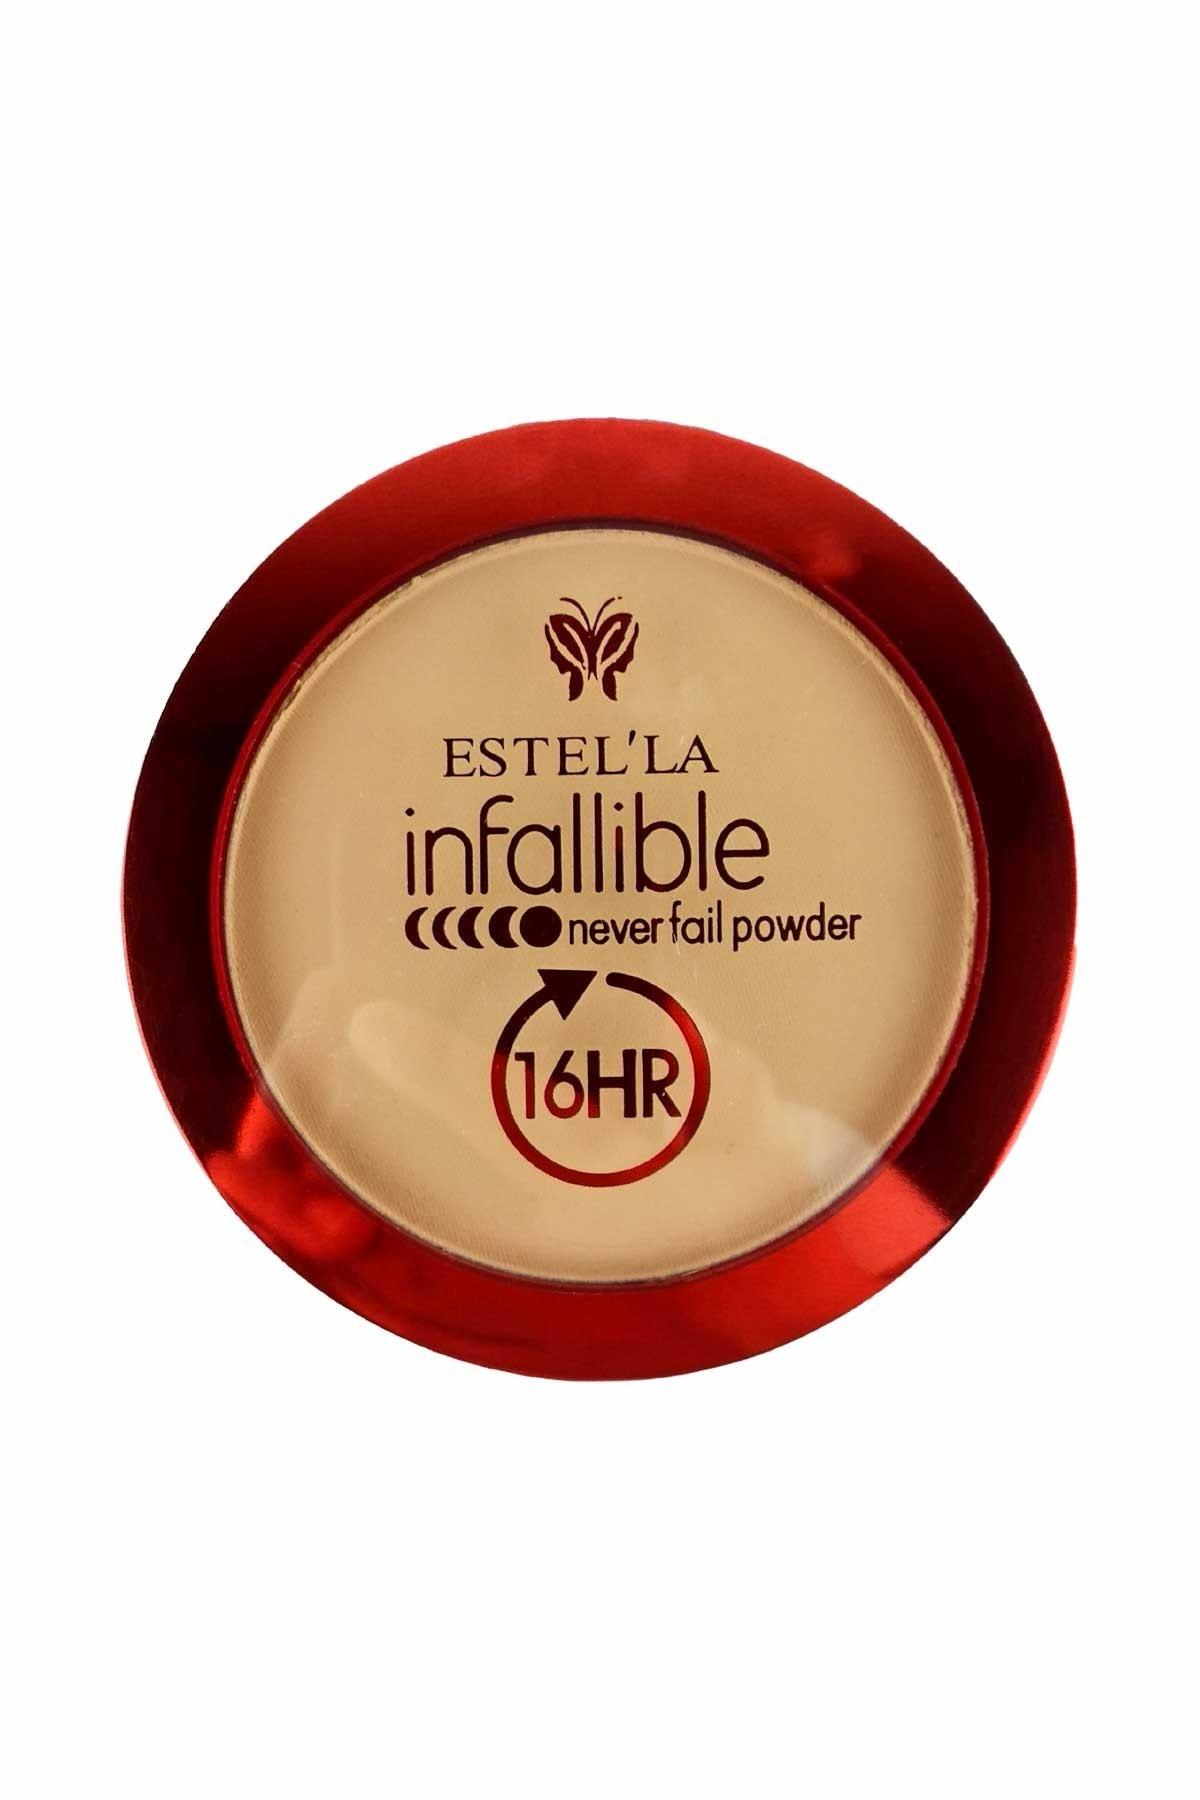 Estella Pudra - Infallible Powder No : 2 8682162500721 1